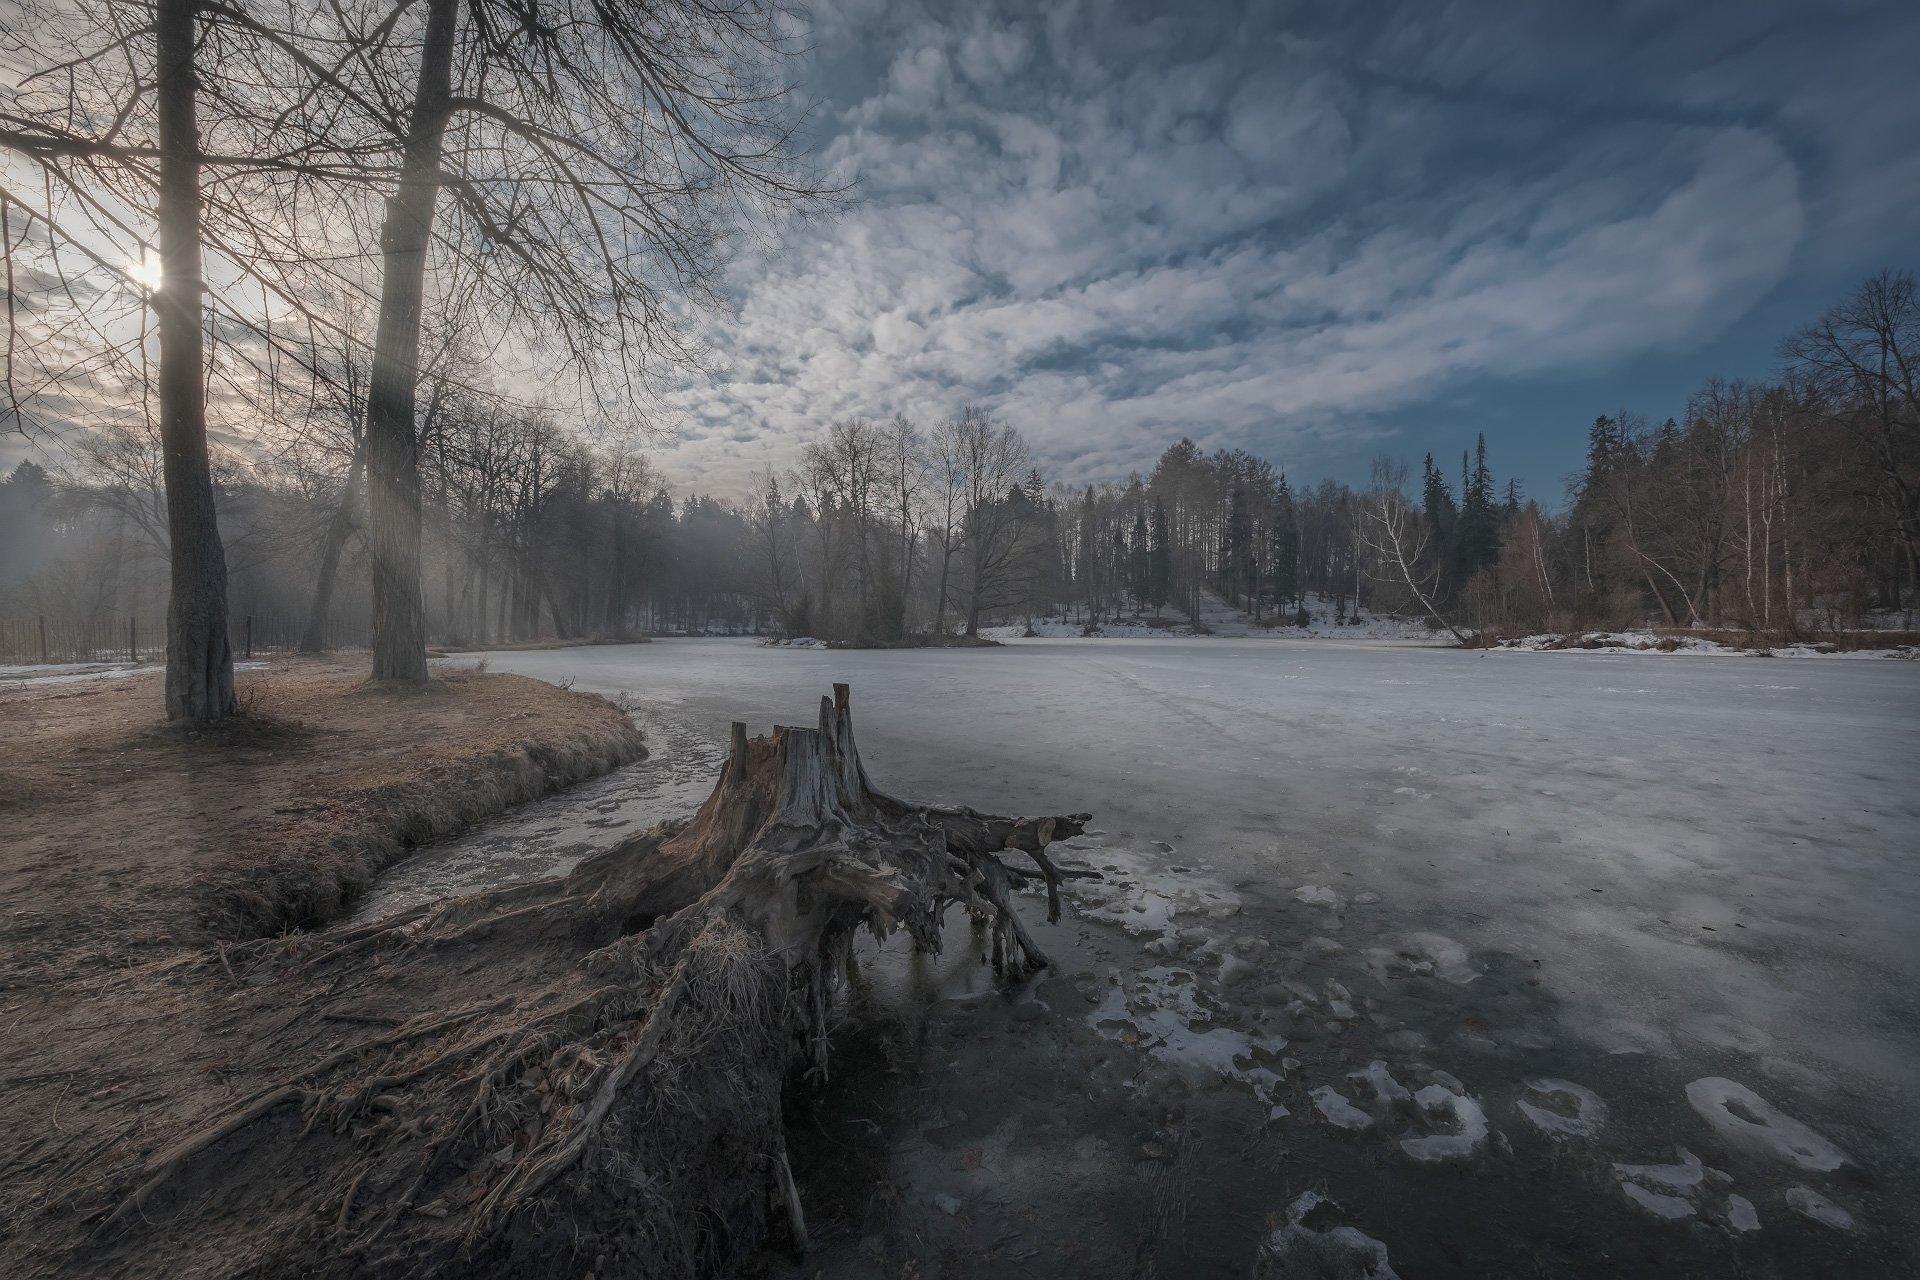 середниково, барский, пруд, утро, туман, солнце, рассвет, деревья, весна, апрель, Андрей Чиж